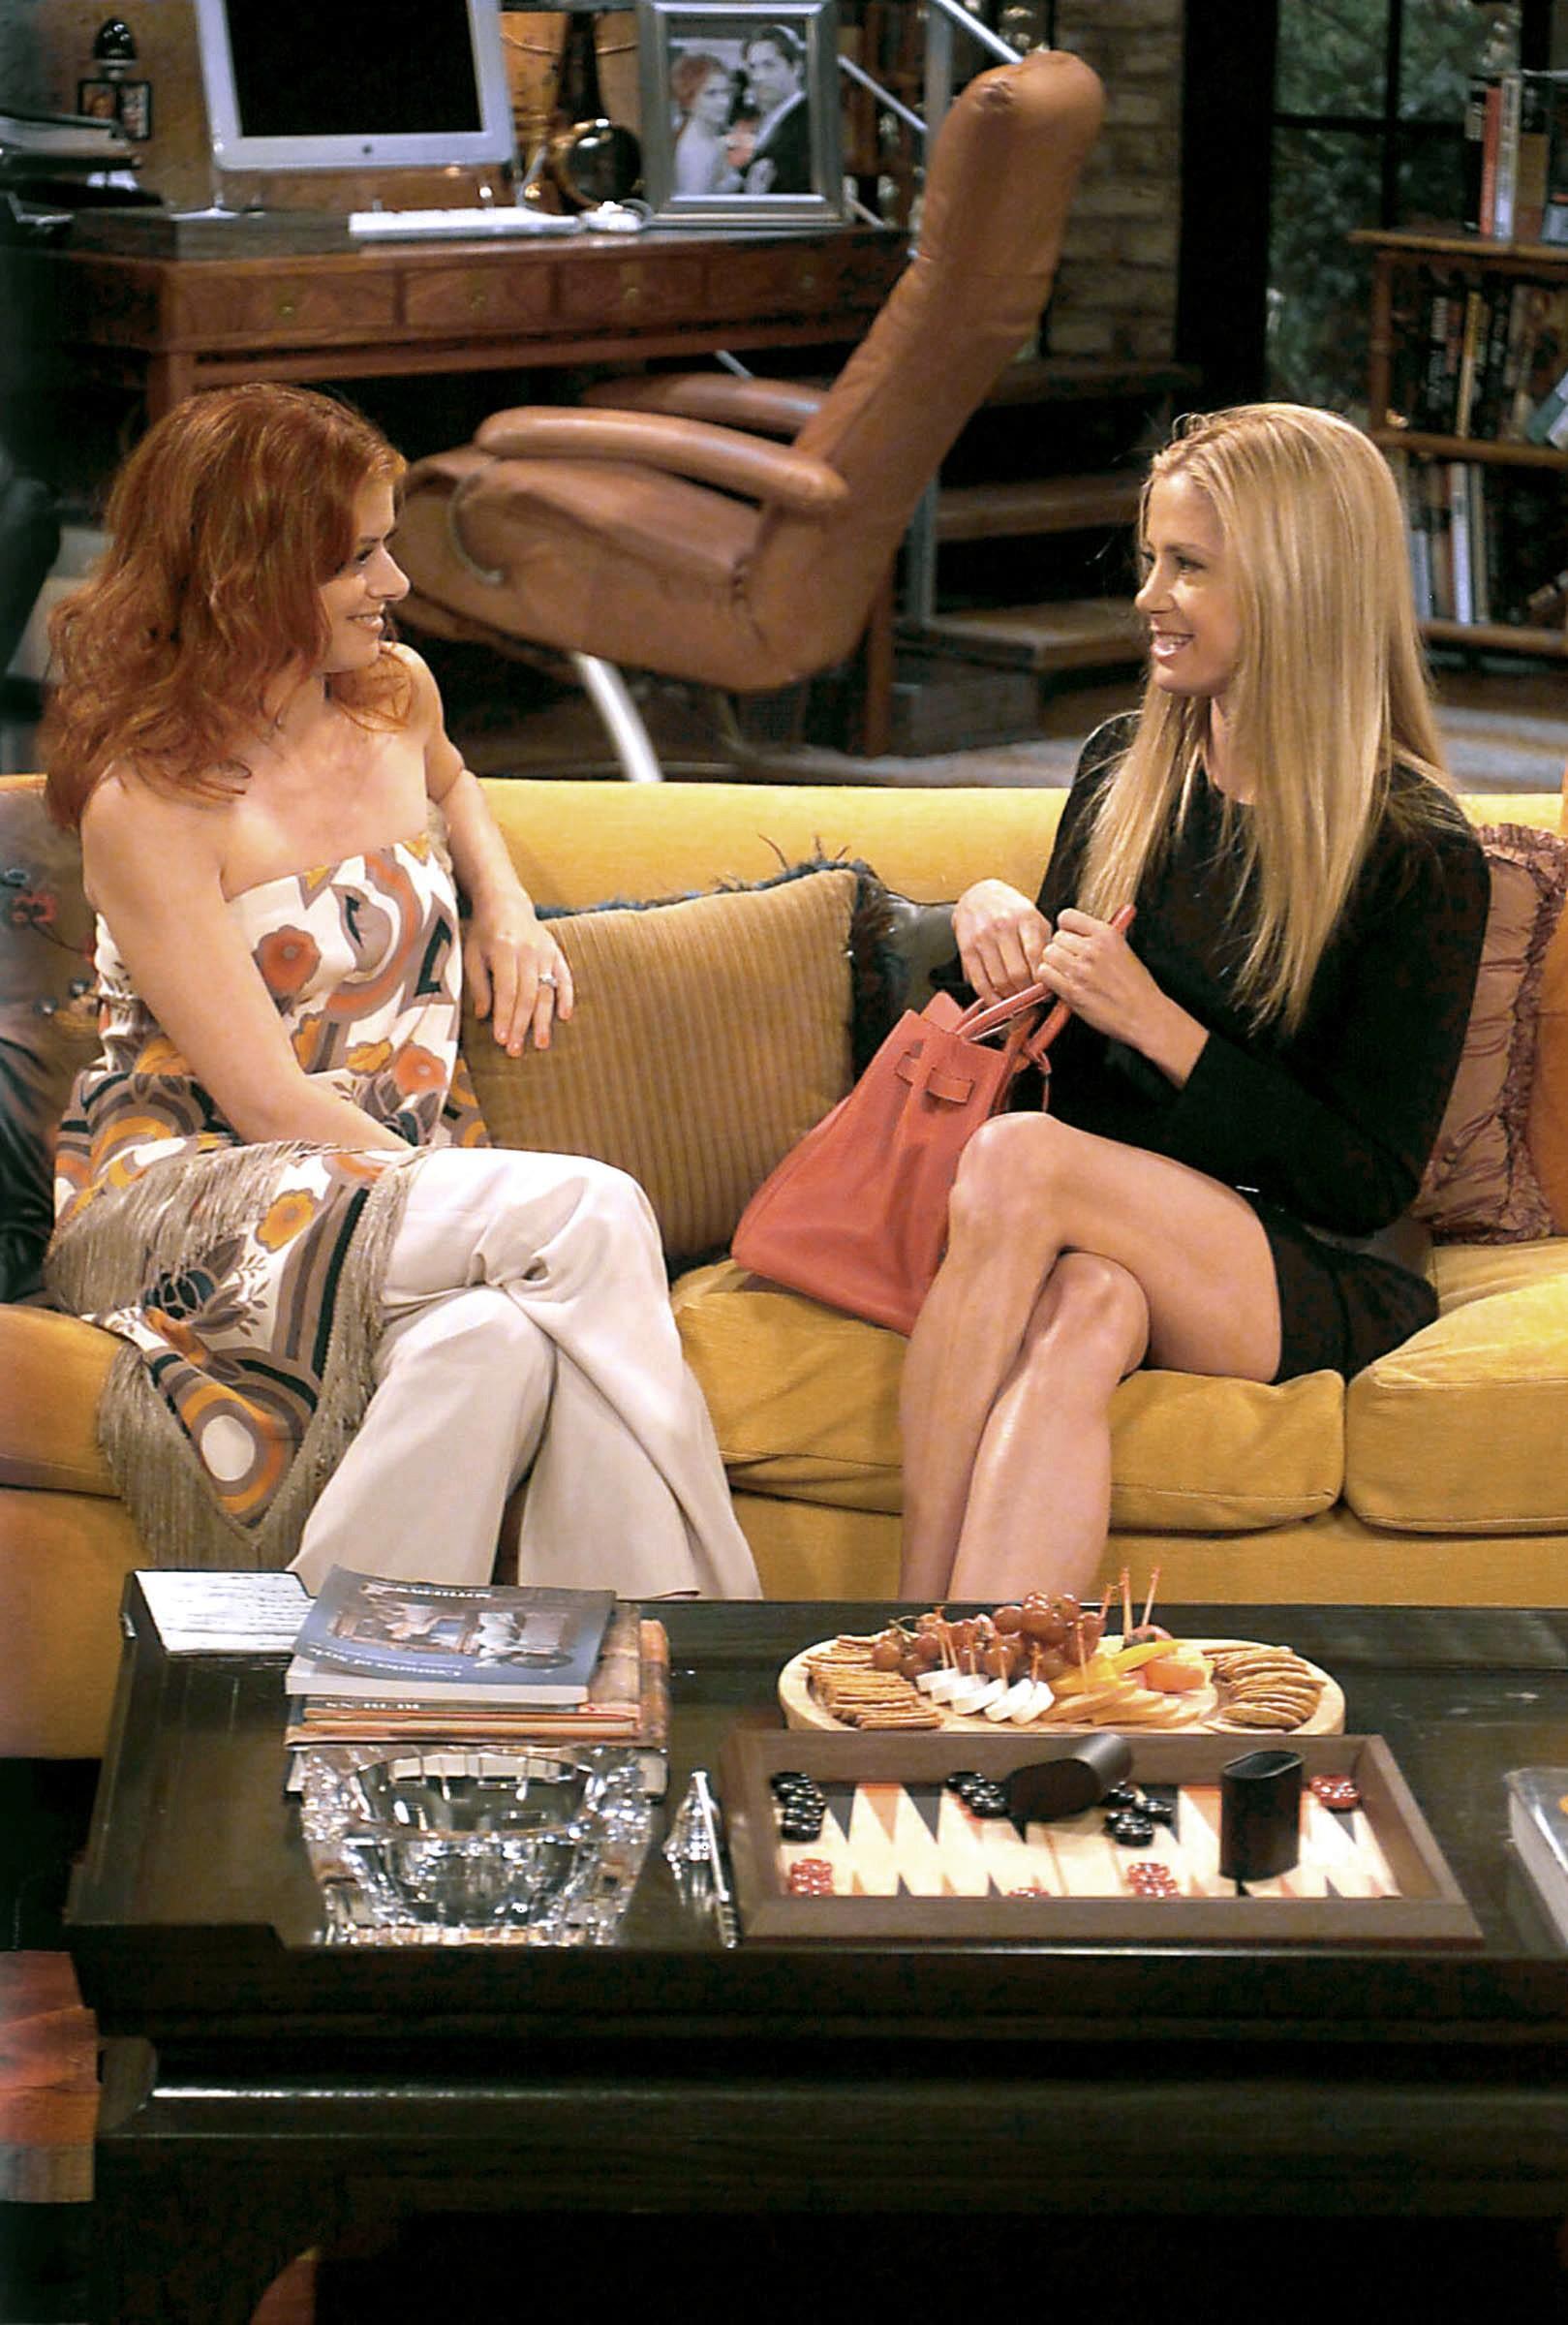 WILL & GRACE, 'Last Ex To Brookland', (Season 6, aired 10/02/03), Debra Messing, Mira Sorvino, 1998-, © NBC / Courtesy: Everett Collection